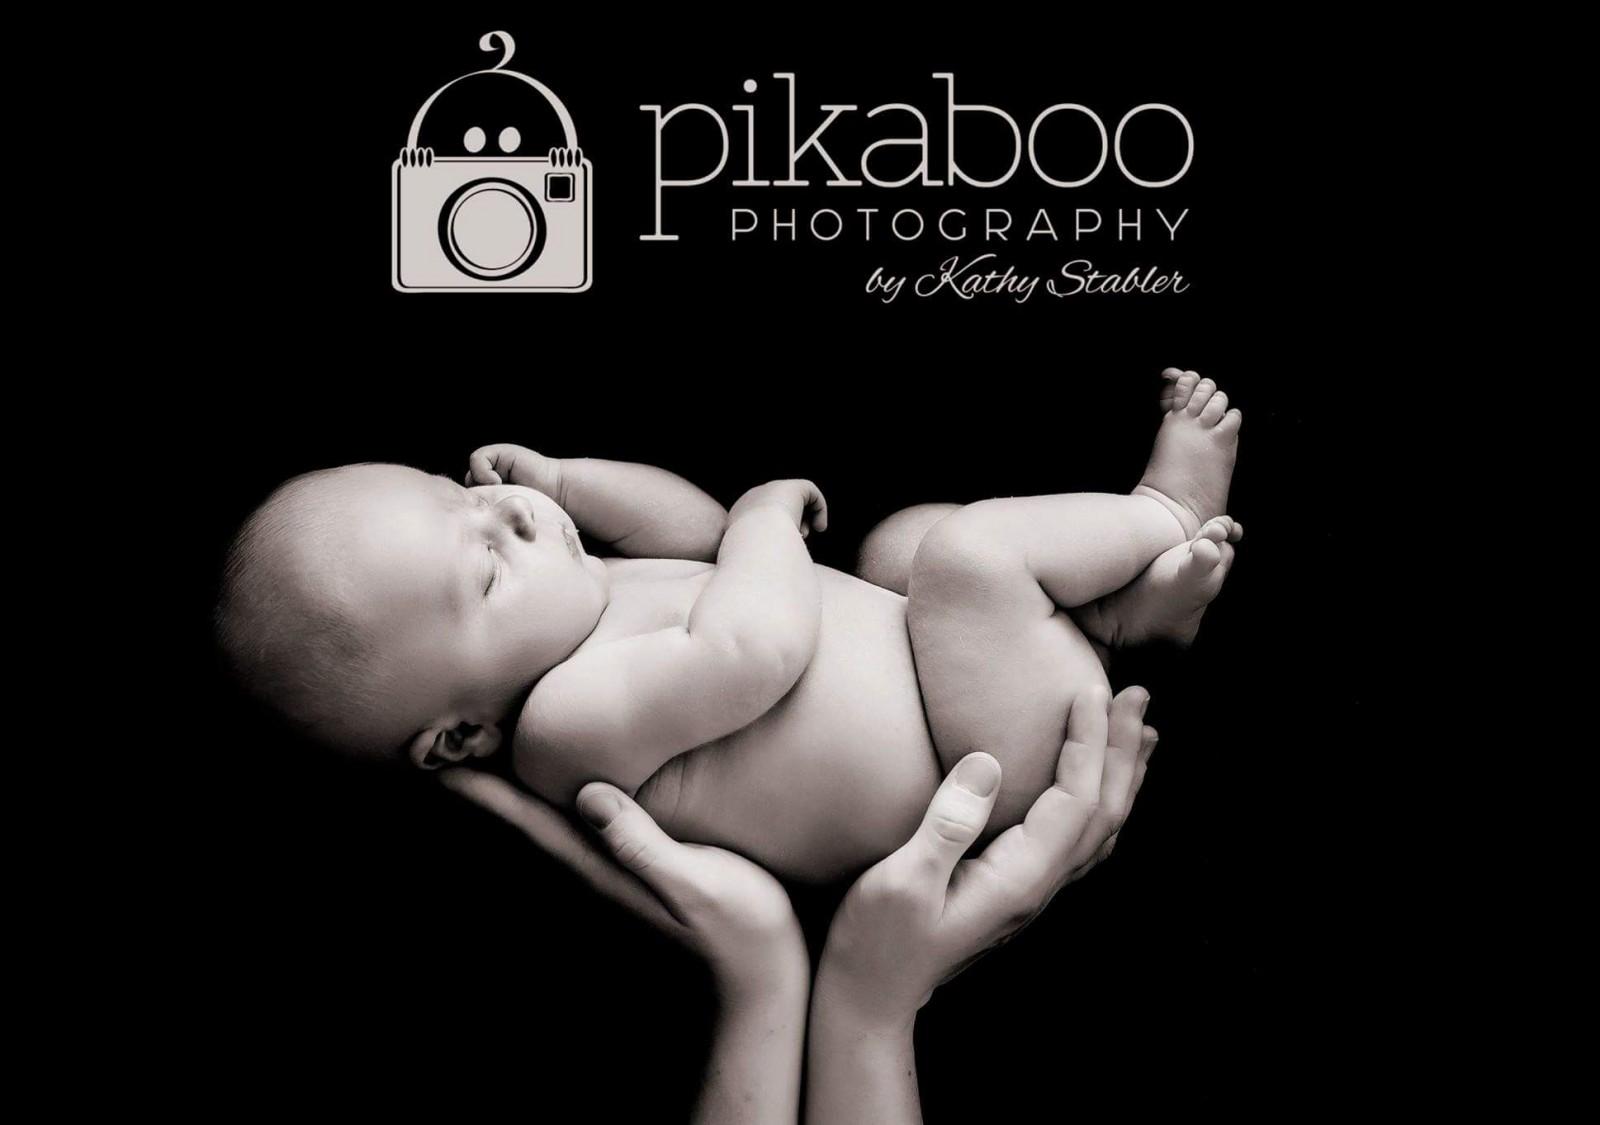 Pikaboo Photography Portfolio